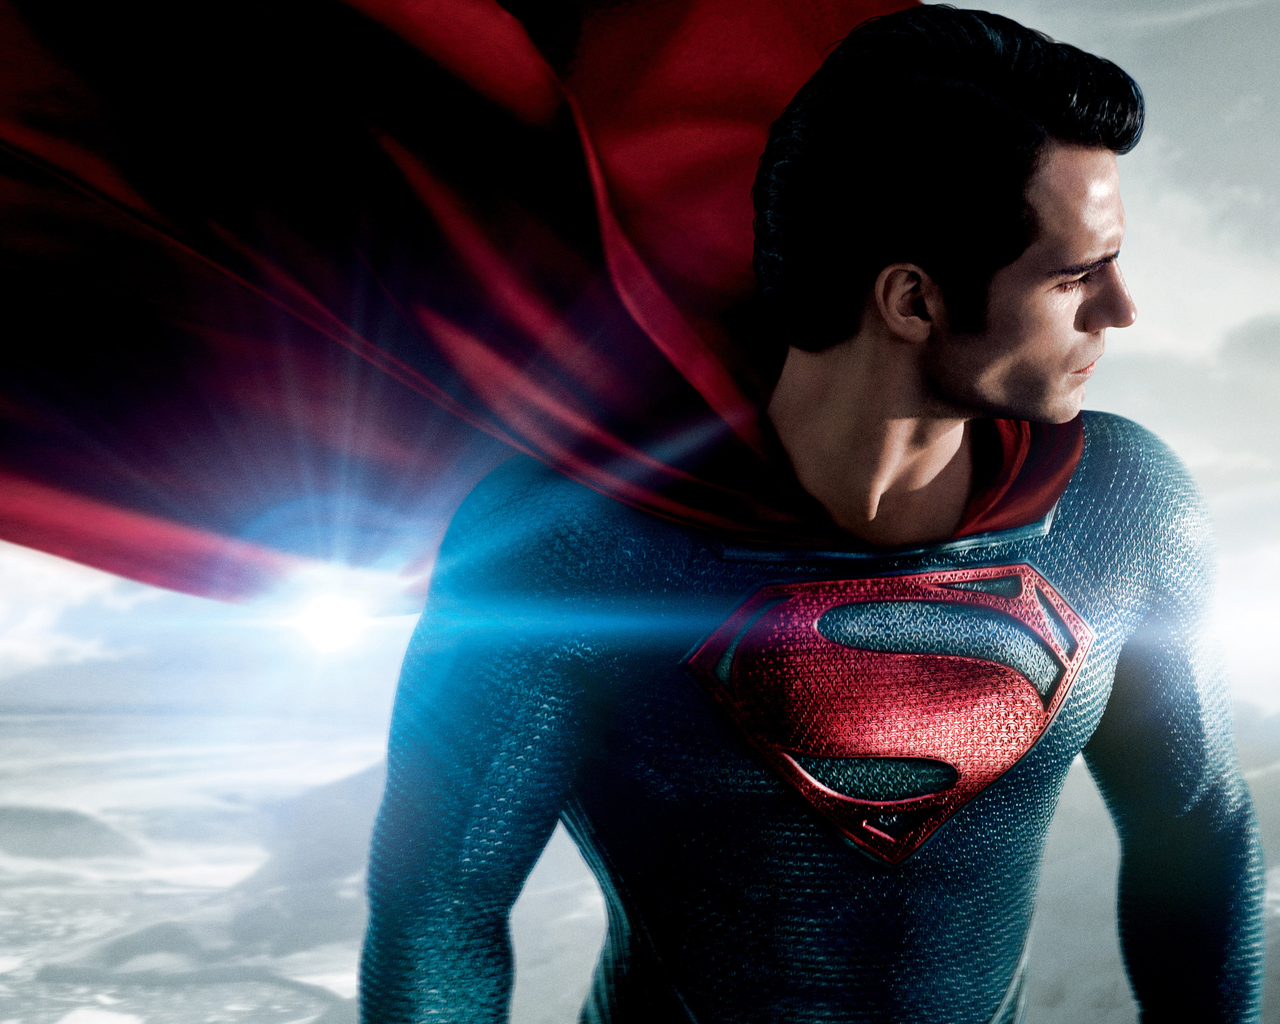 image - man-of-steel-wallpaper-superman-34759958-1280-1024 | dc